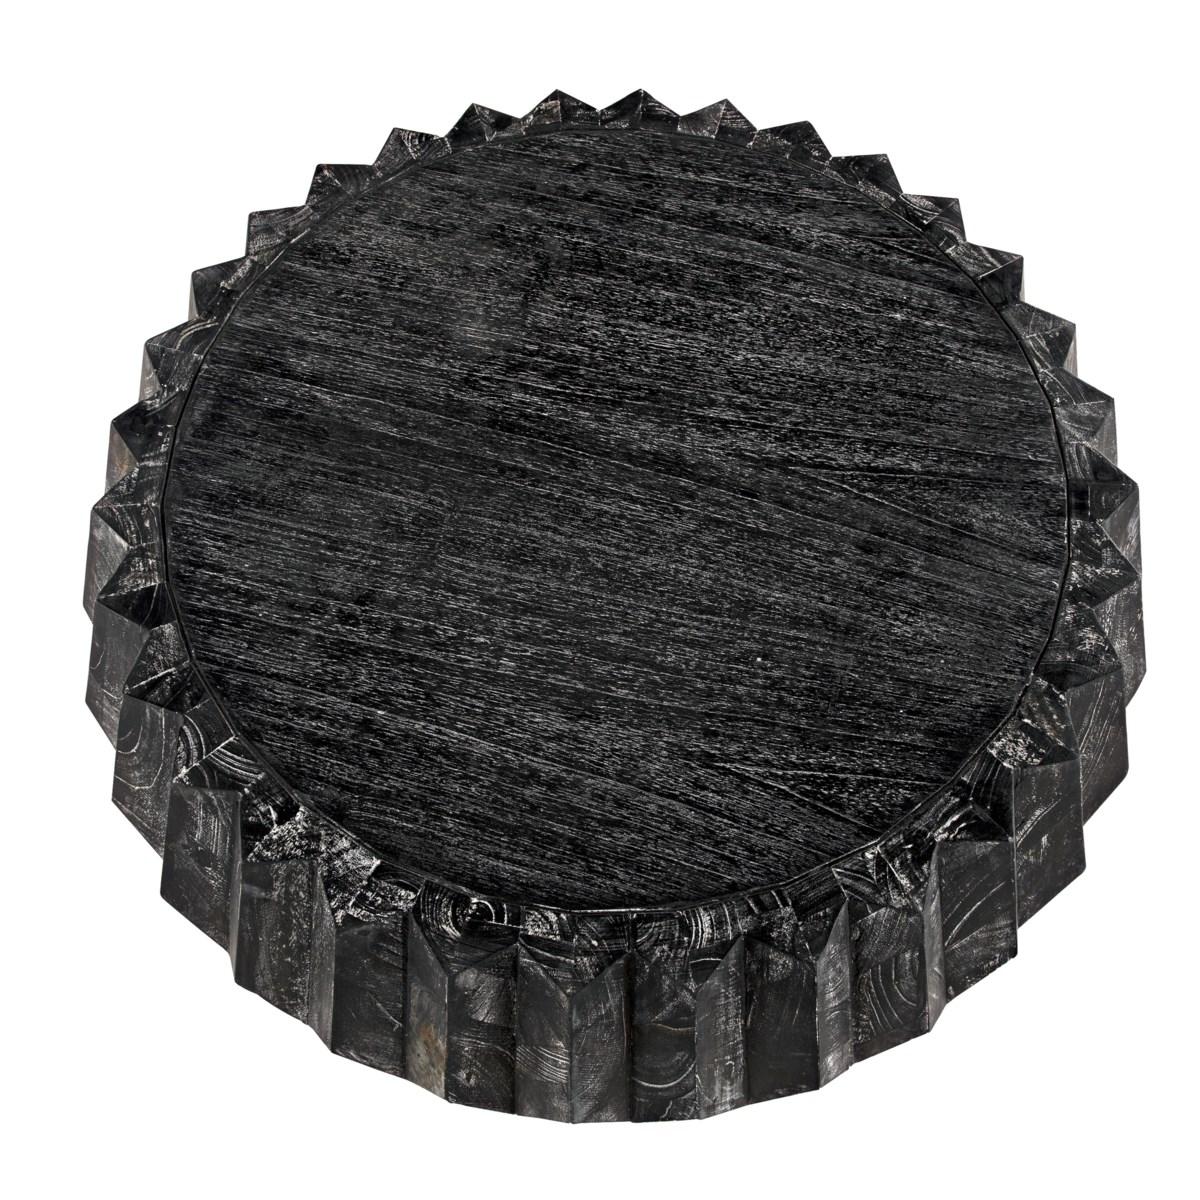 Tamela Coffee Table, Cinder Black